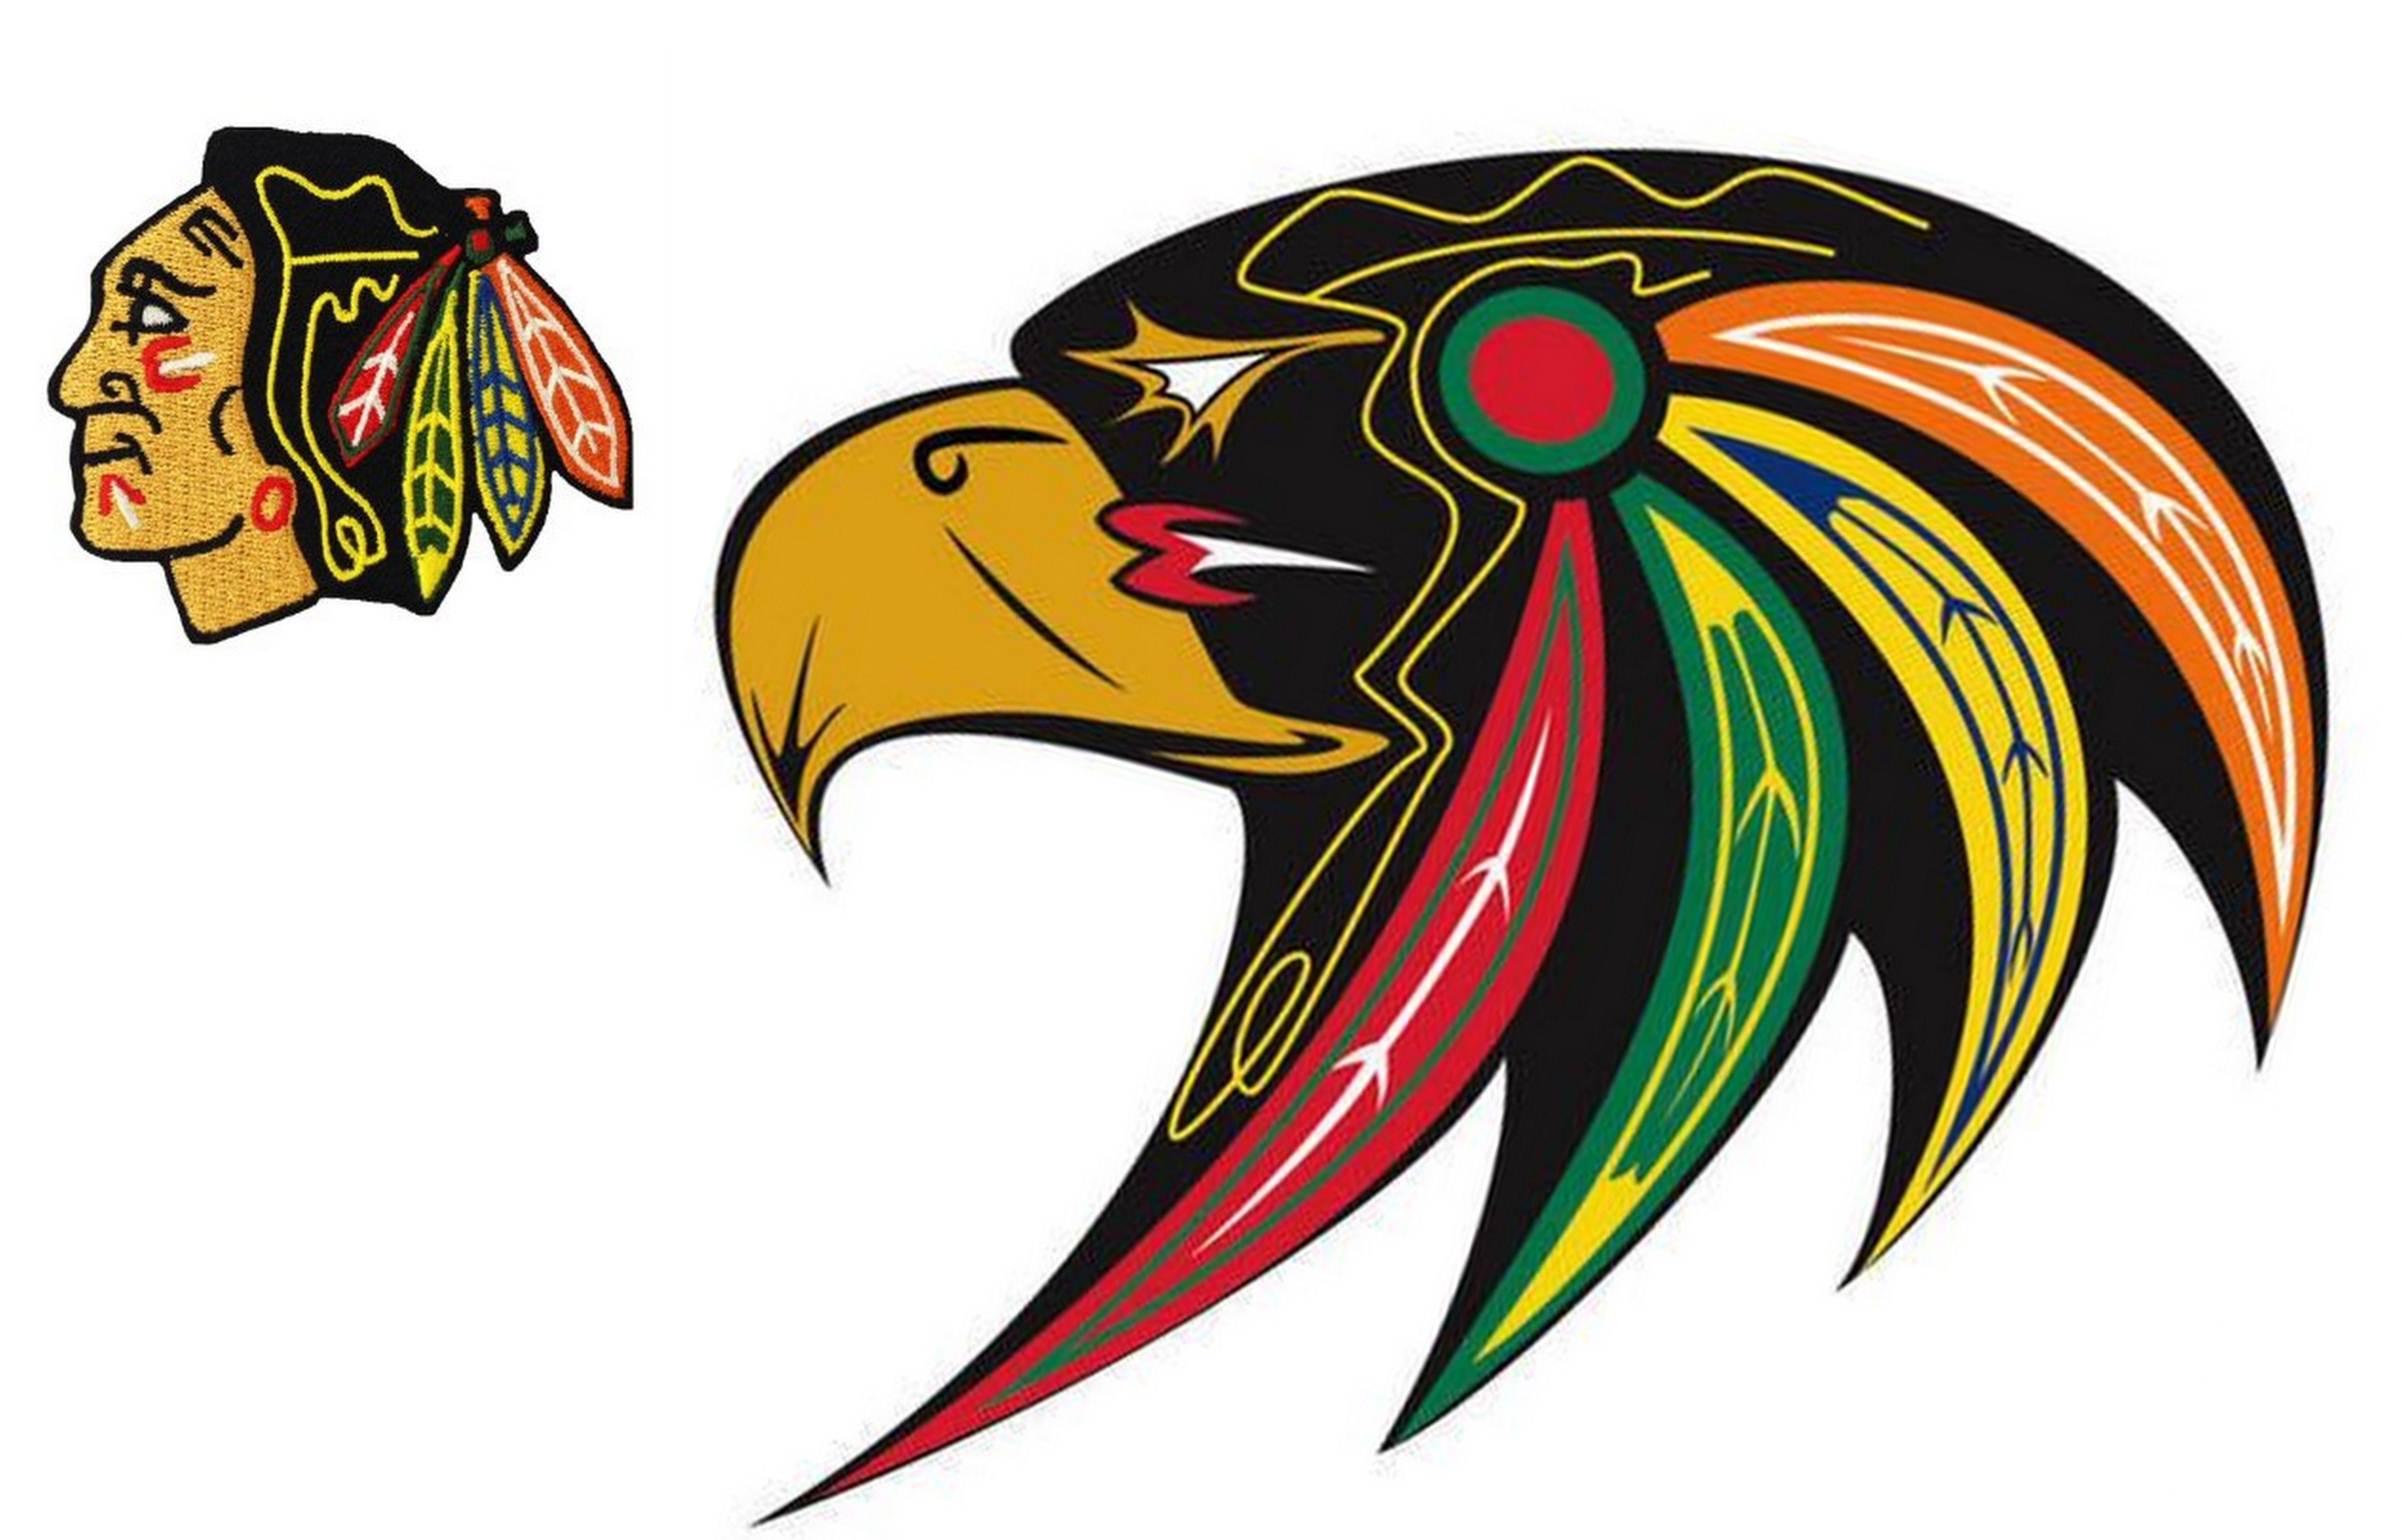 BlackHawks Gear on Chicago blackhawks logo, Chicago